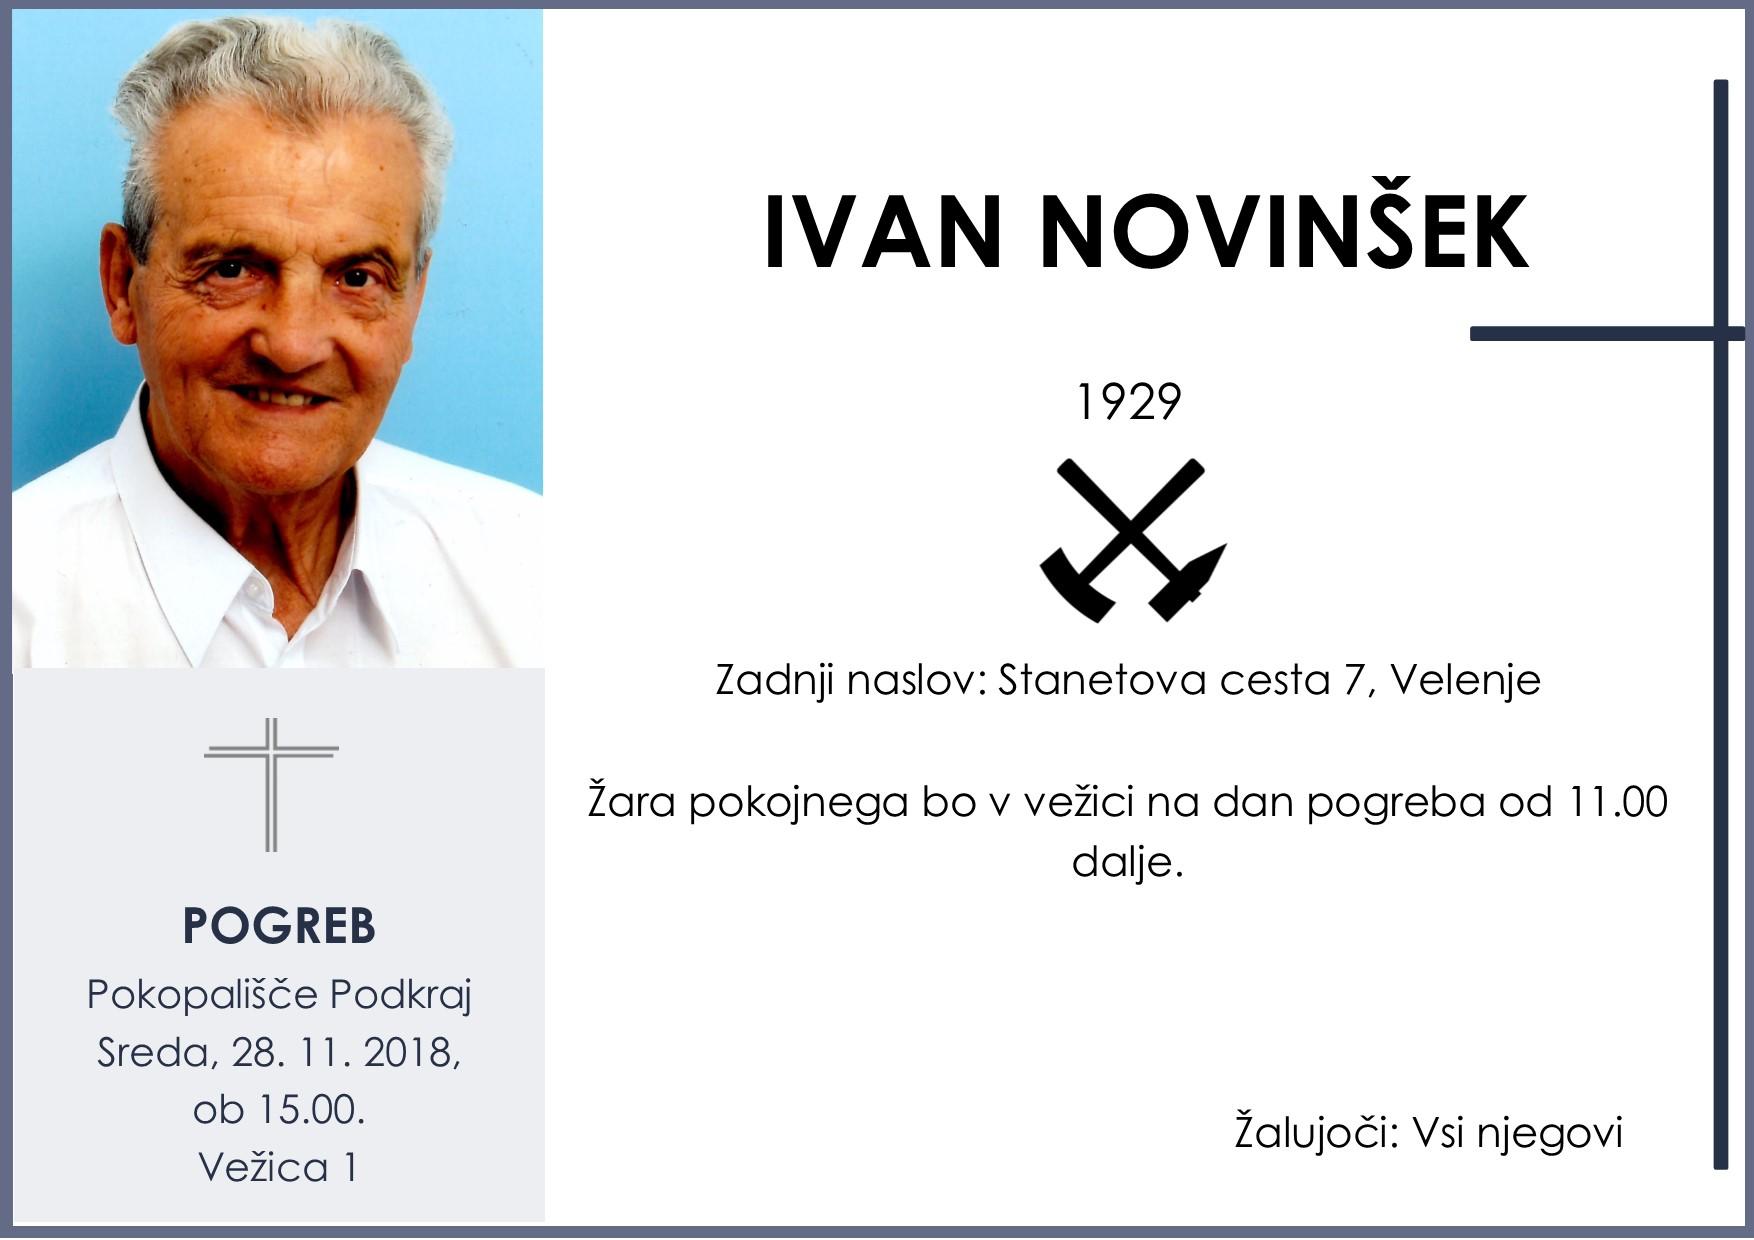 IVAN NOVINŠEK, Podkraj, 28. 11. 2018